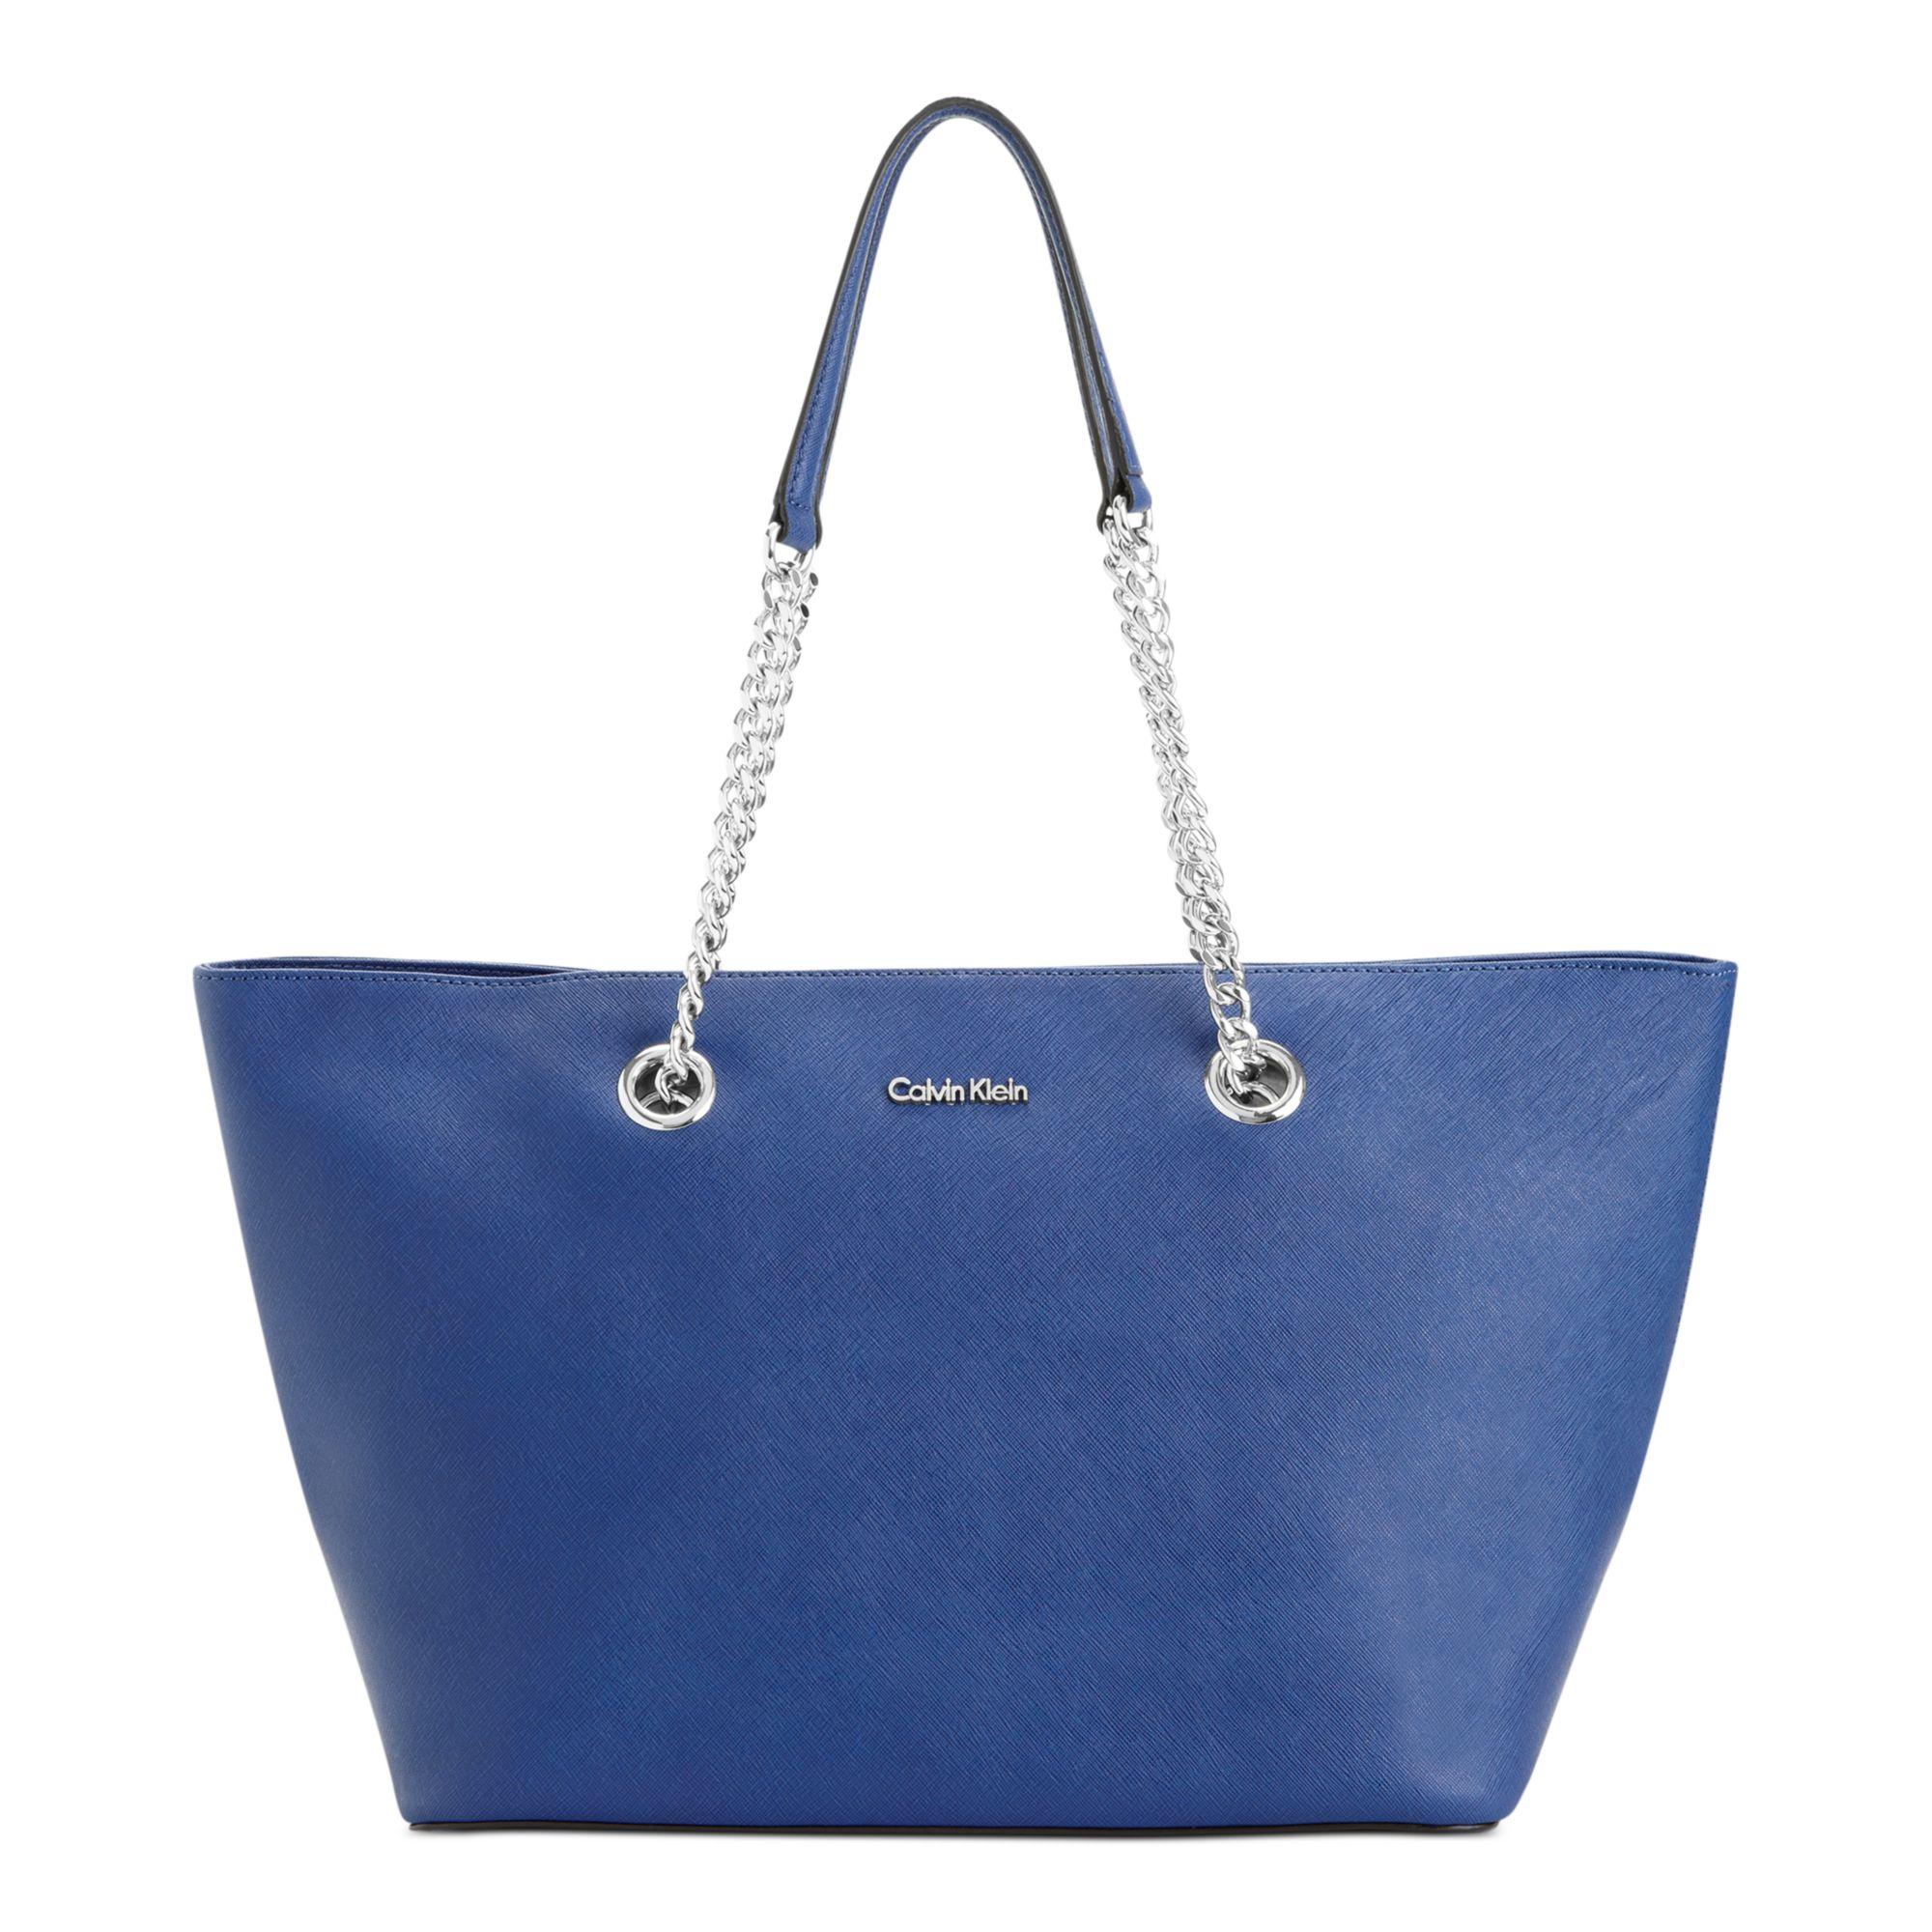 Calvin Klein Bag in Blue (Ink)